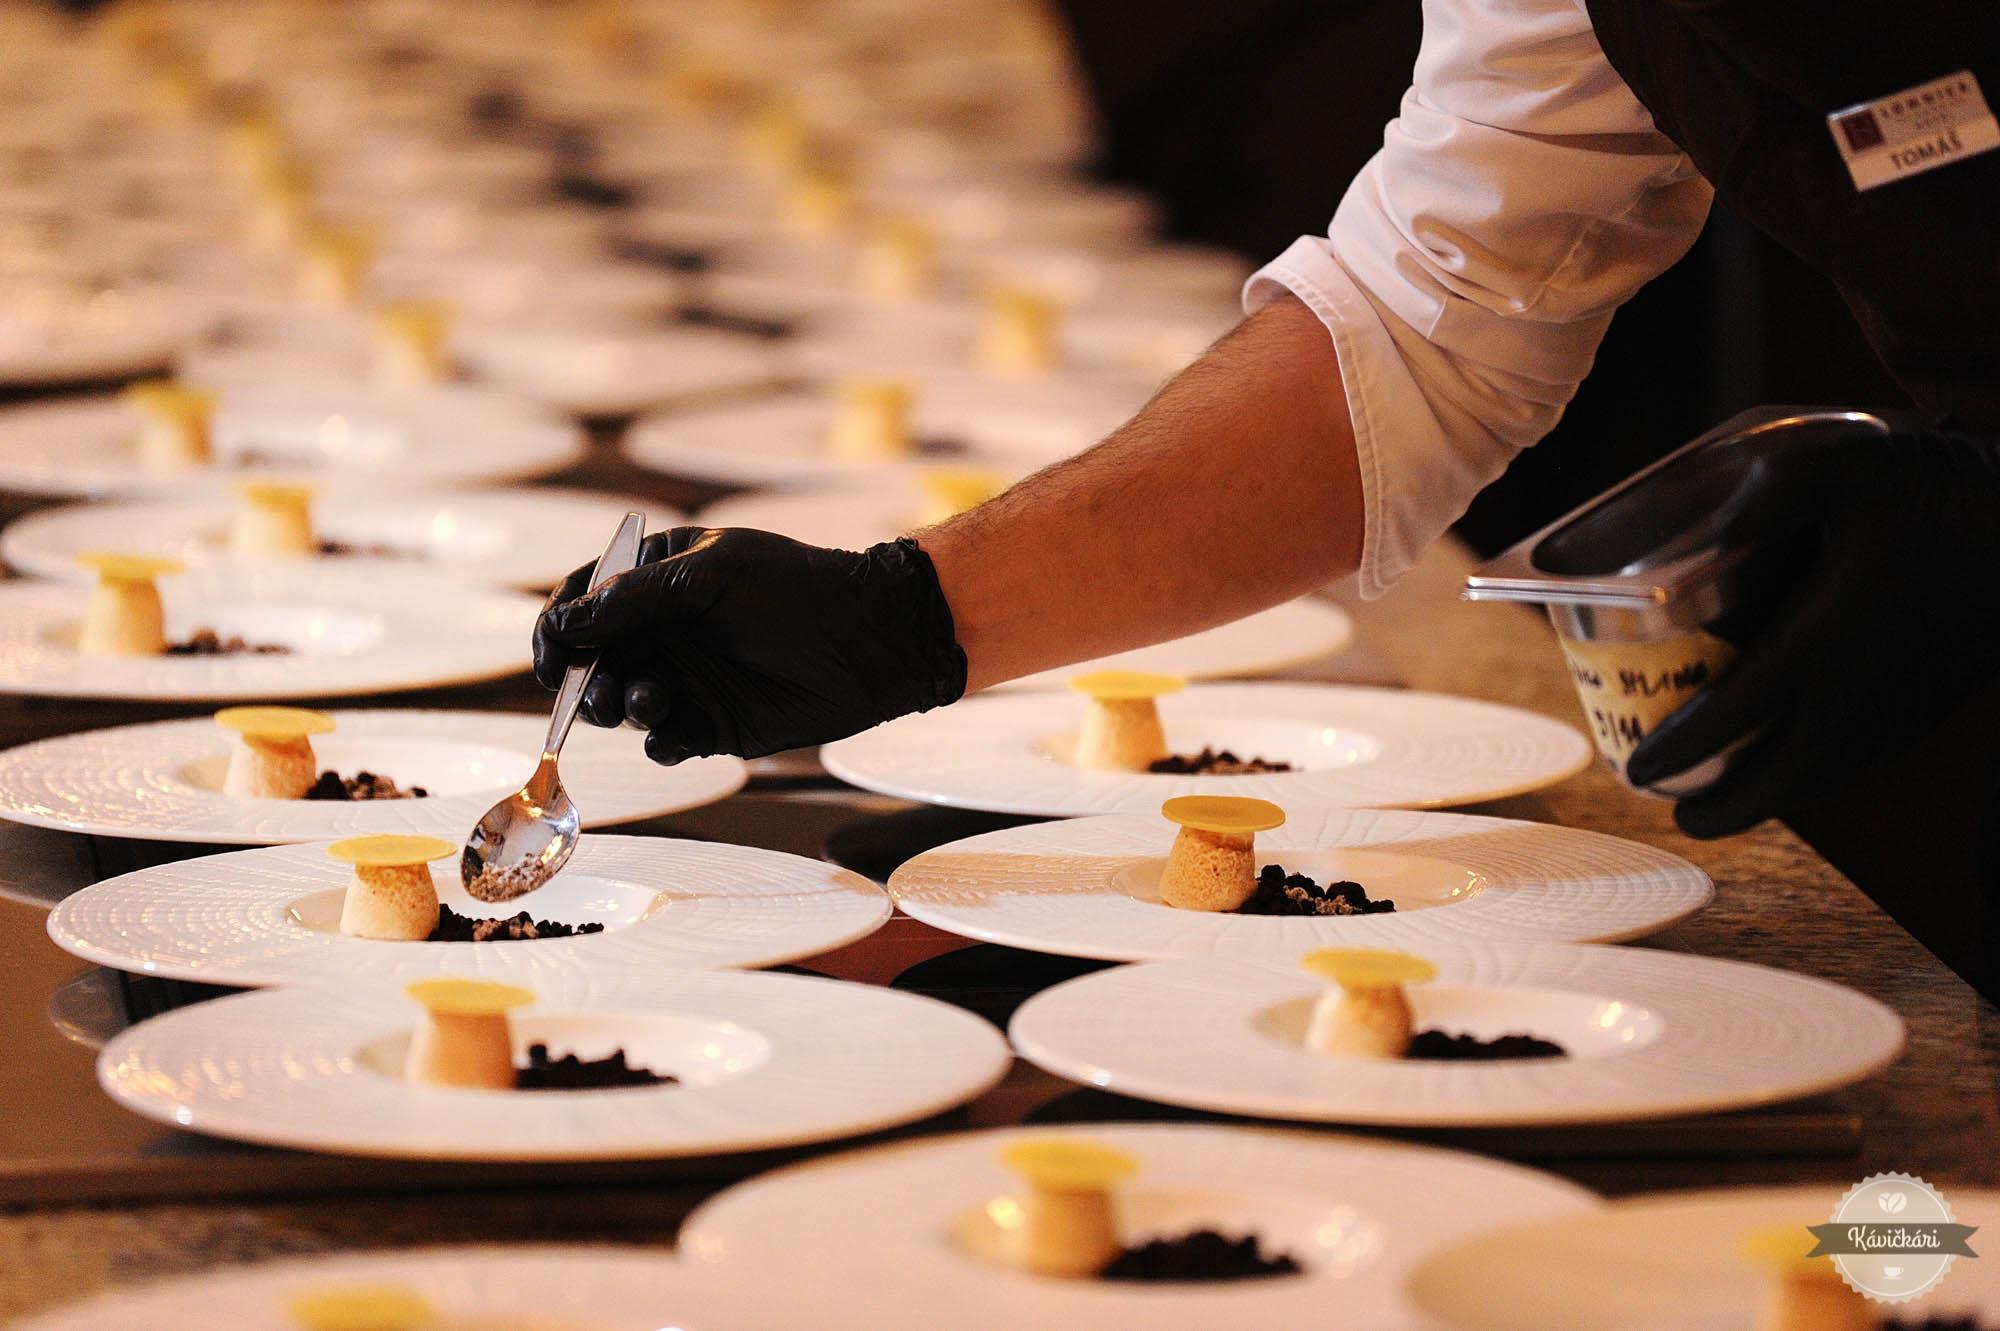 enrico-bartolini-hotel-lomnica-jedlo-menu-servirovanie